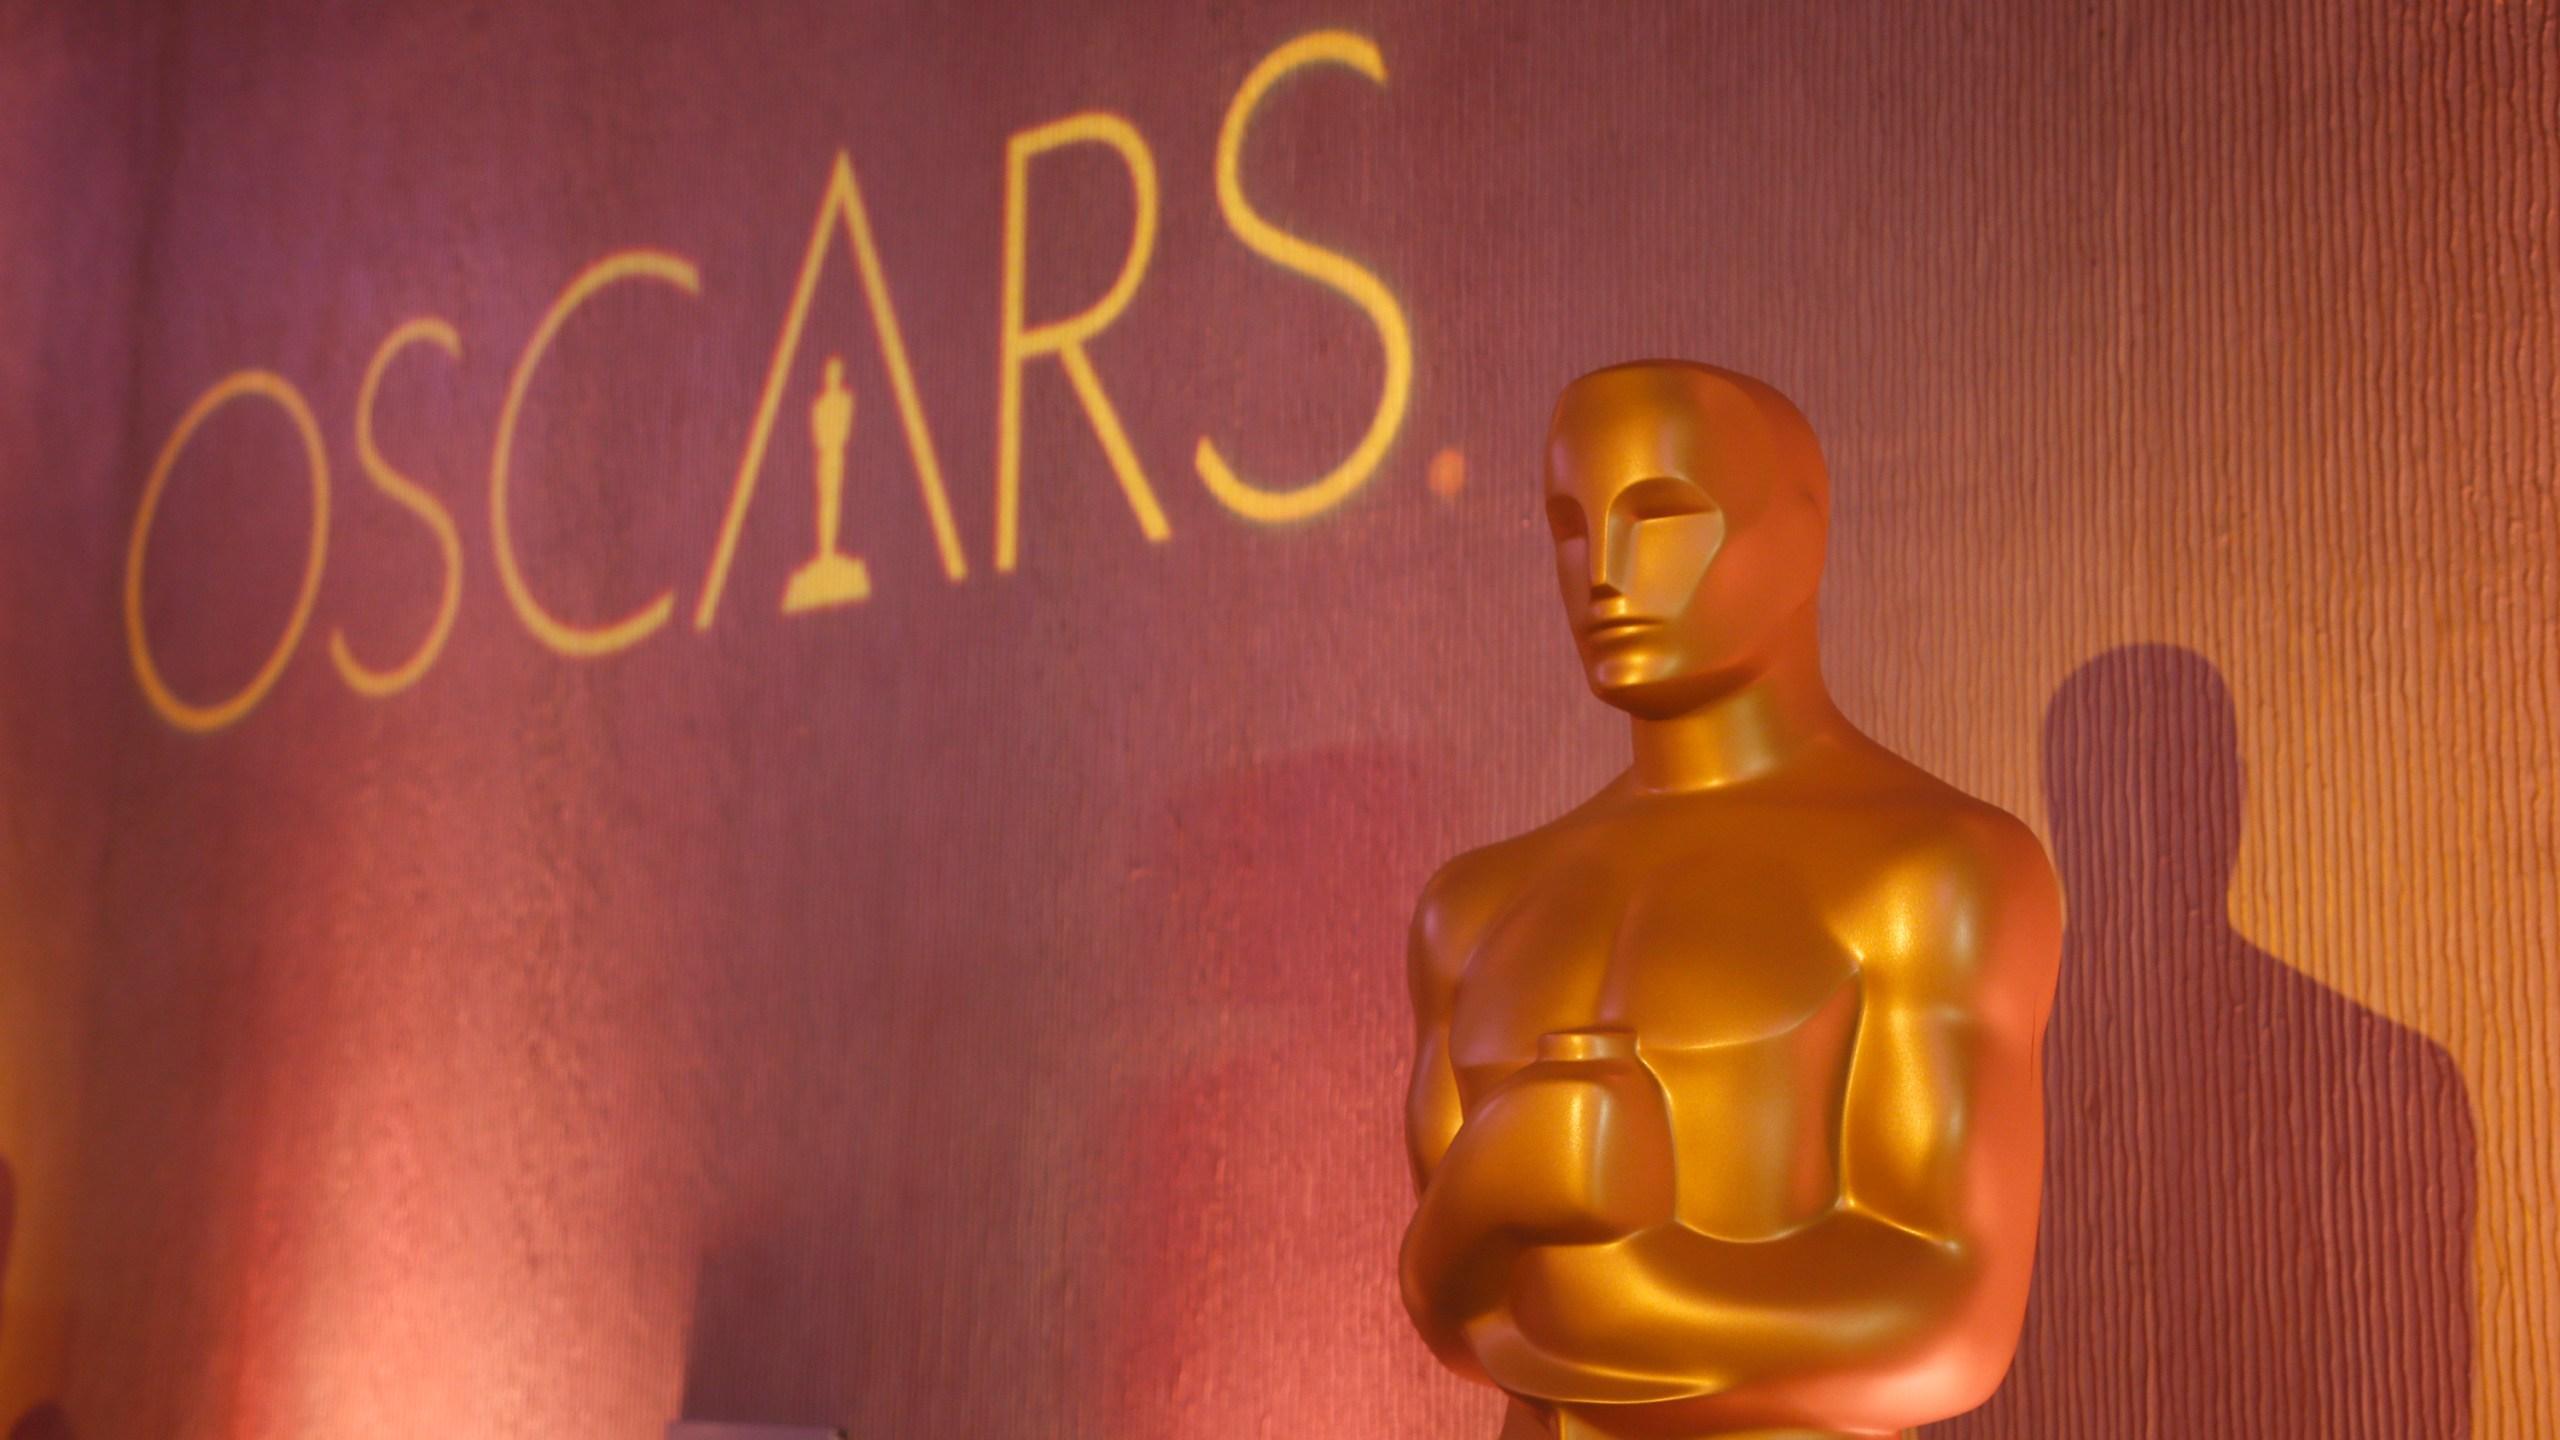 Oscars Popularity Contest_1533921593720